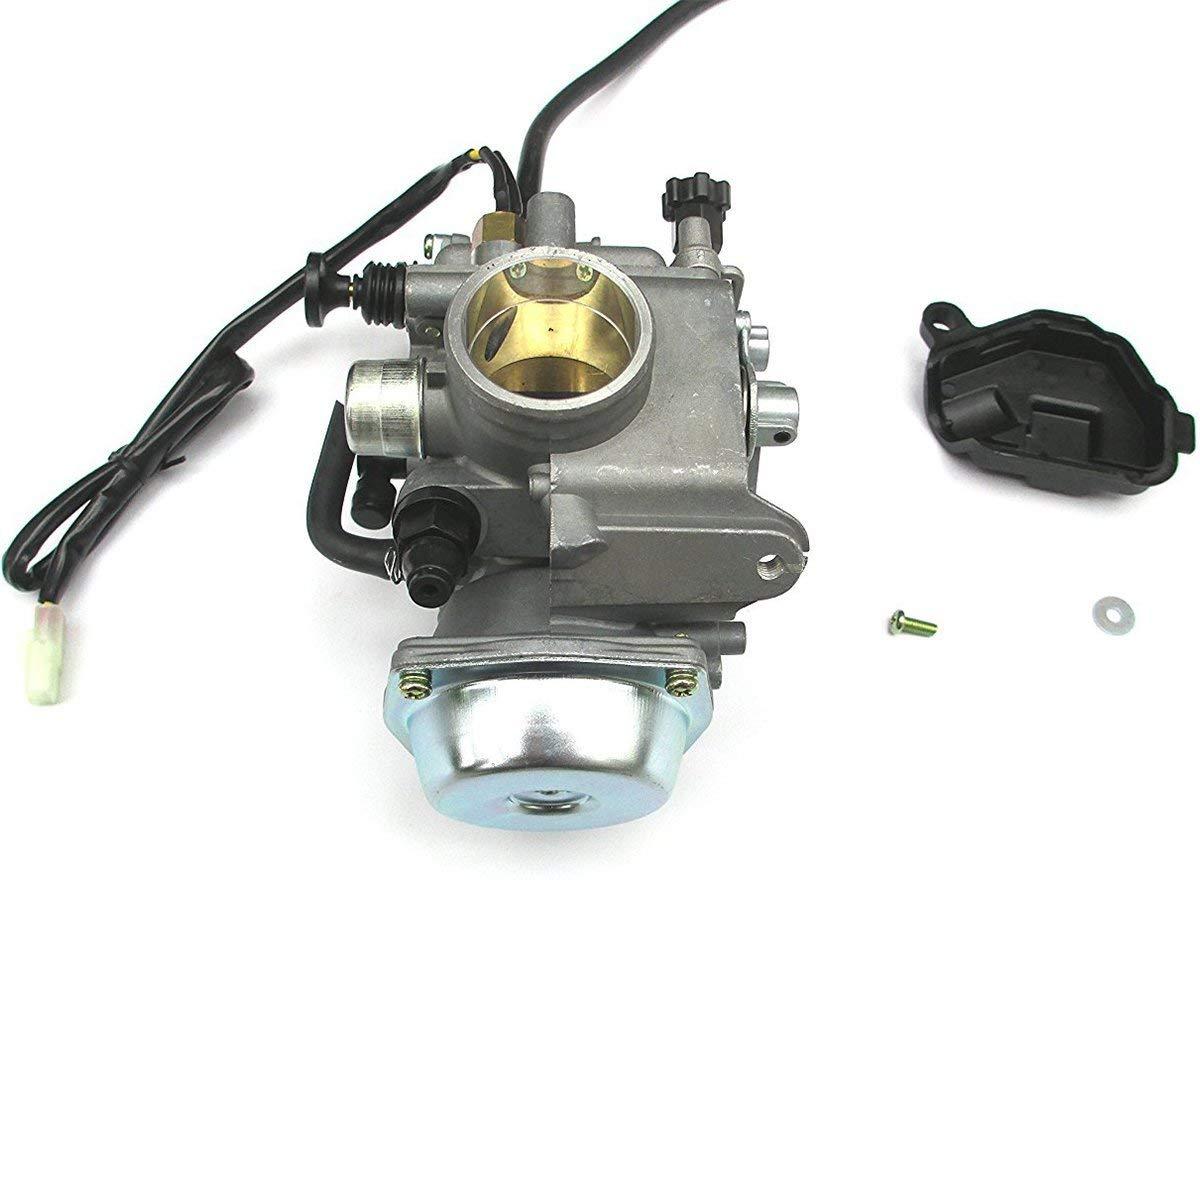 CARBURETOR HONDA TRX450 ATV 450 FOREMAN 450ES //S//FM//FE CARB